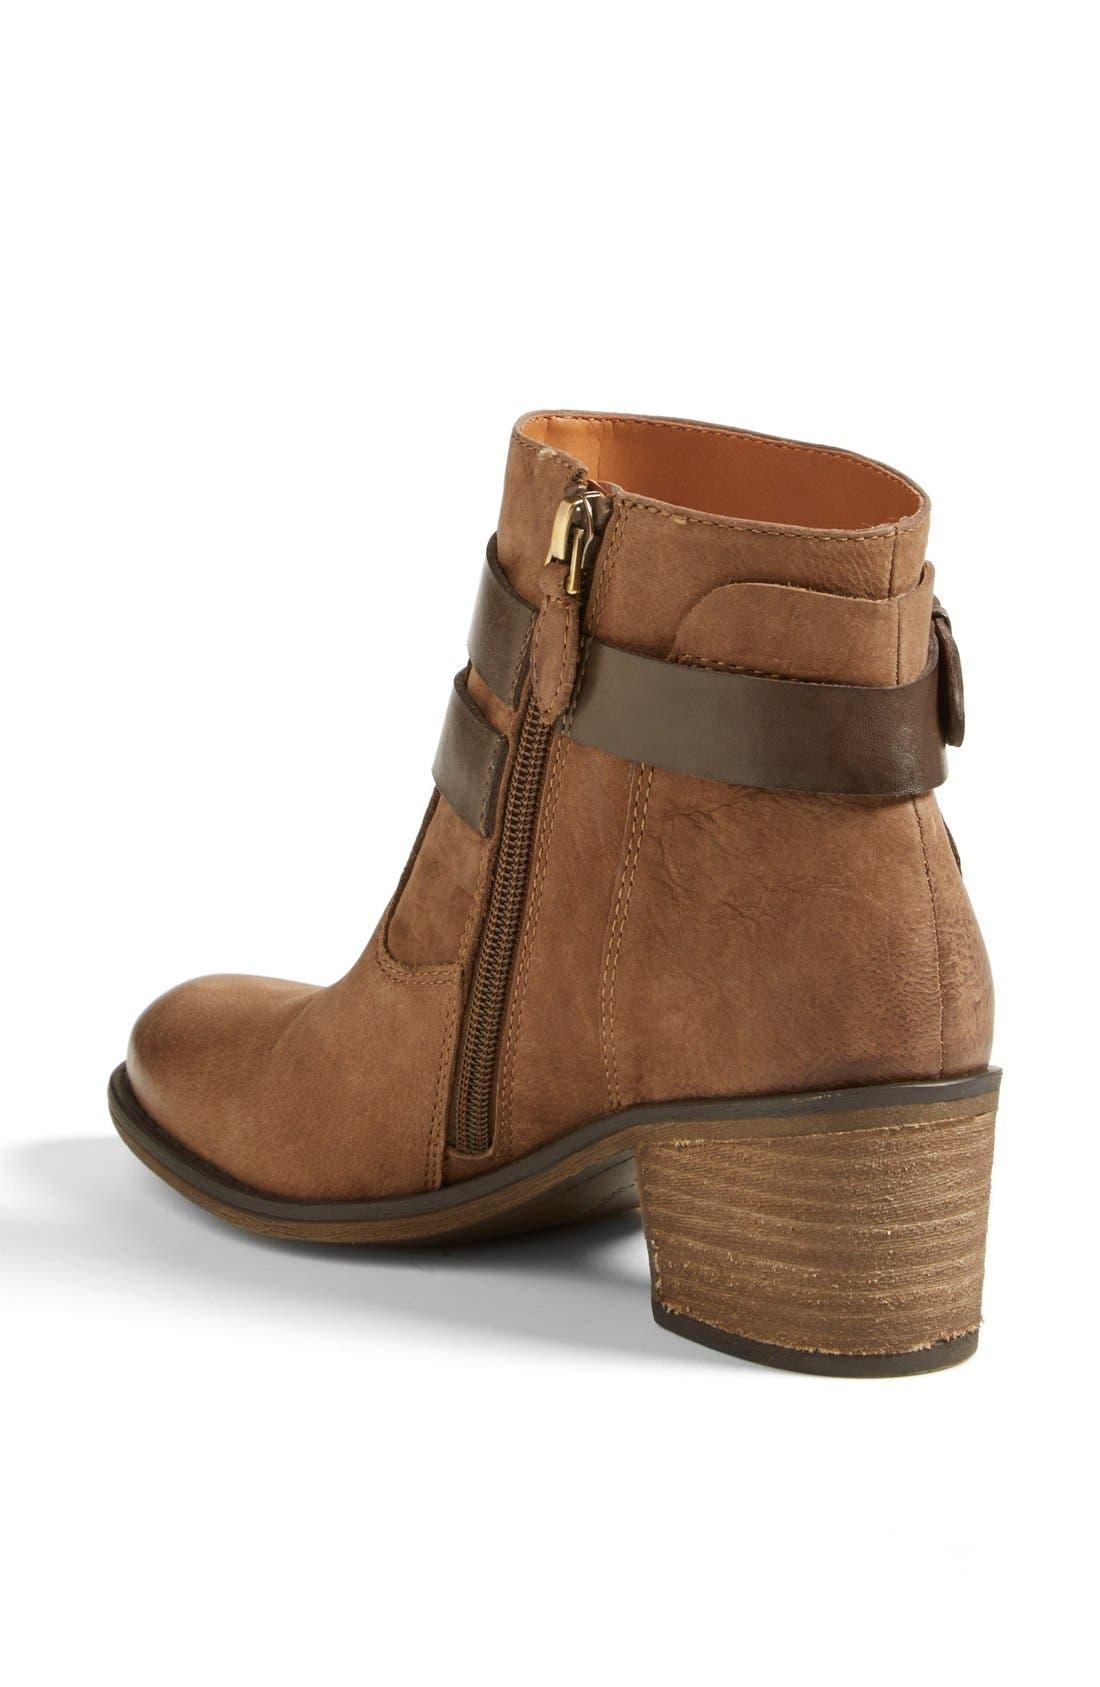 Alternate Image 2  - Franco Sarto 'Linden' Leather Bootie (Women) (Nordstrom Exclusive)